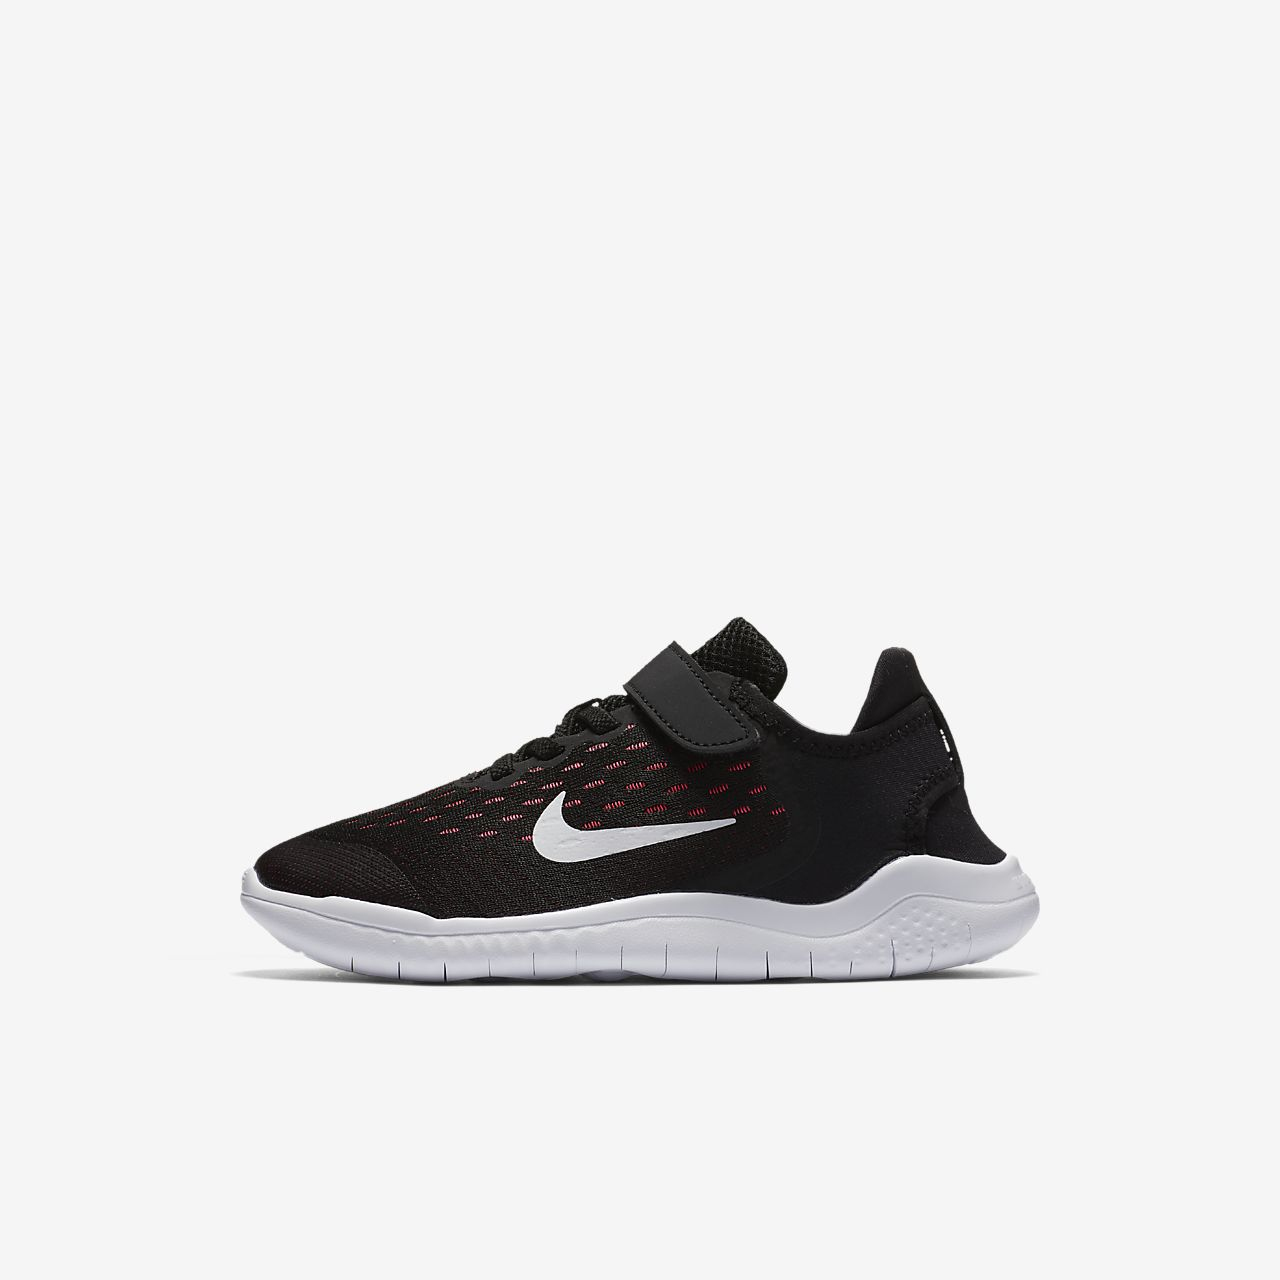 nike free children's shoes nz